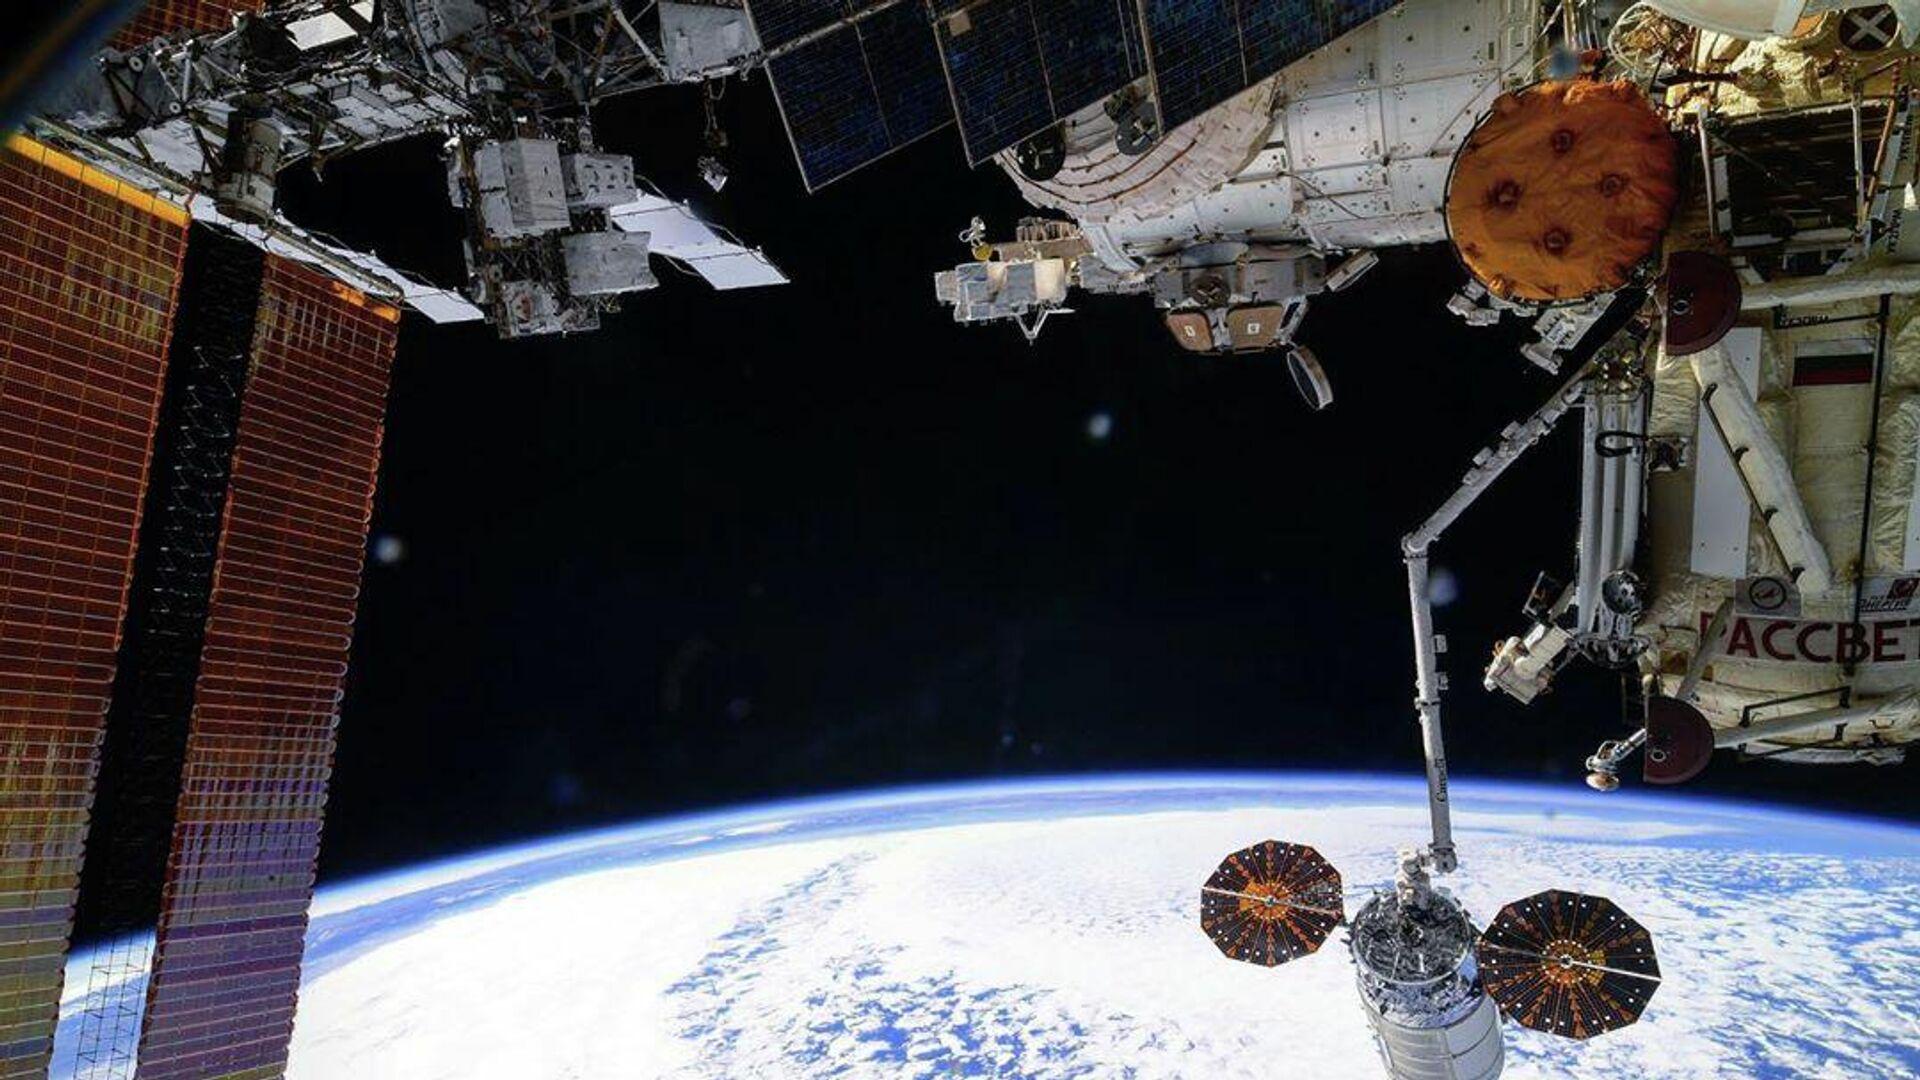 Космический грузовик Cygnus покинул МКС после трех месяцев на орбите